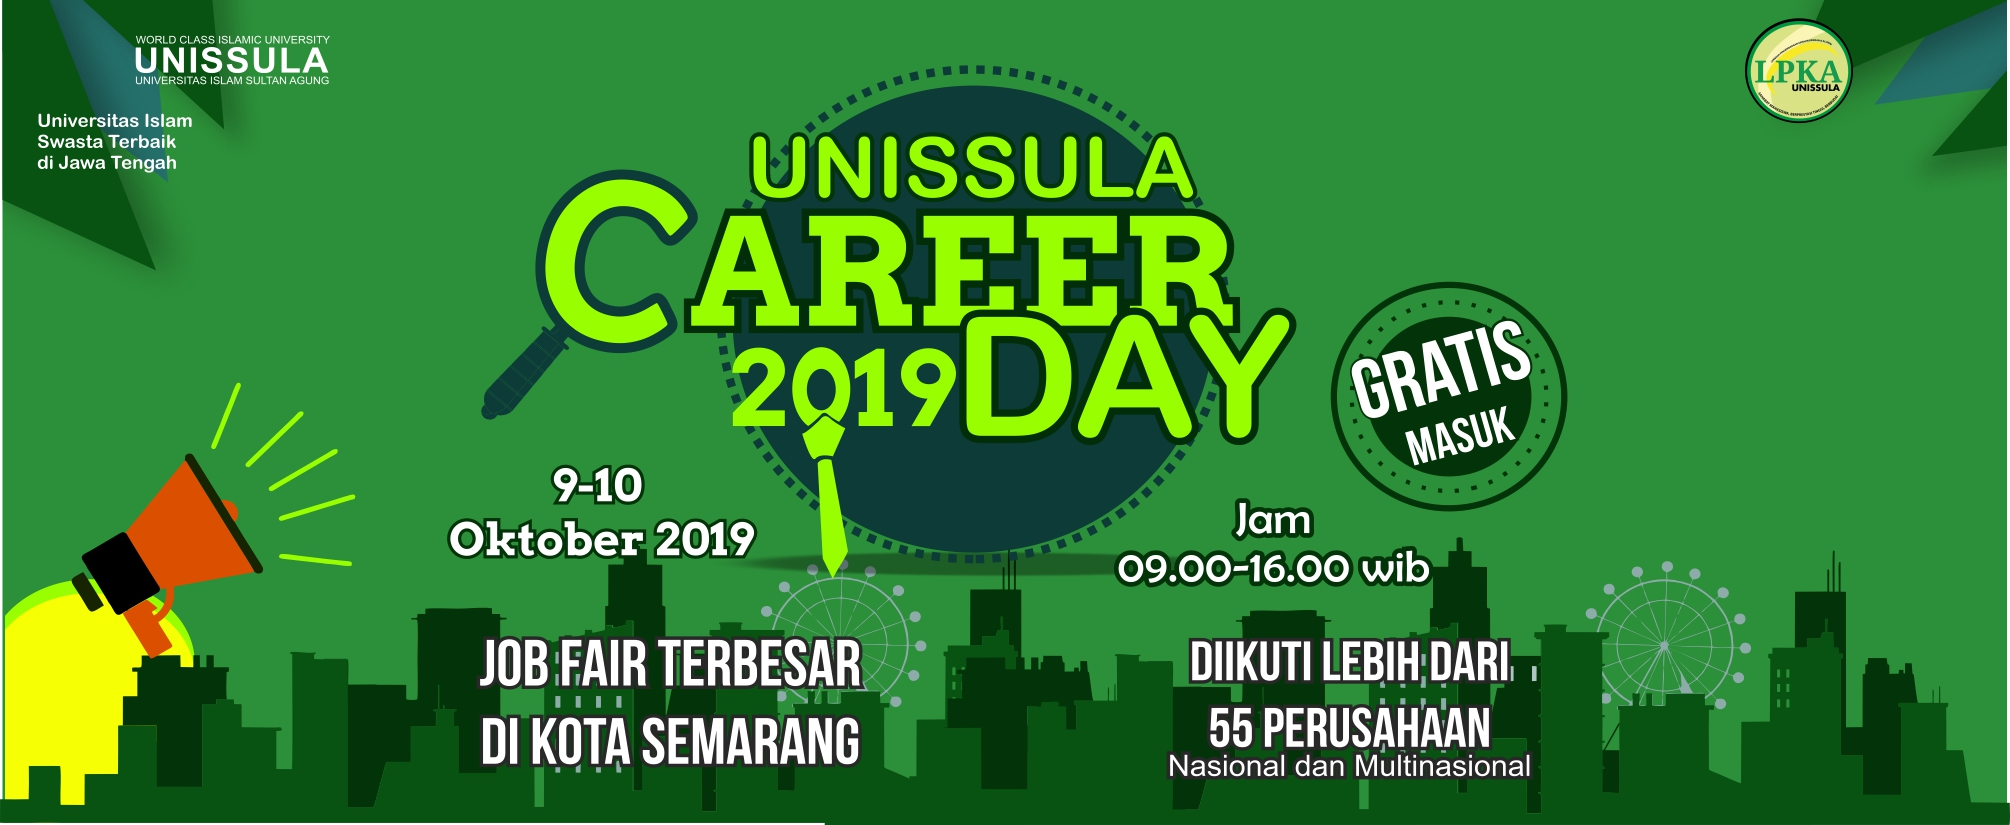 UNISSULA CAREER DAY 2019